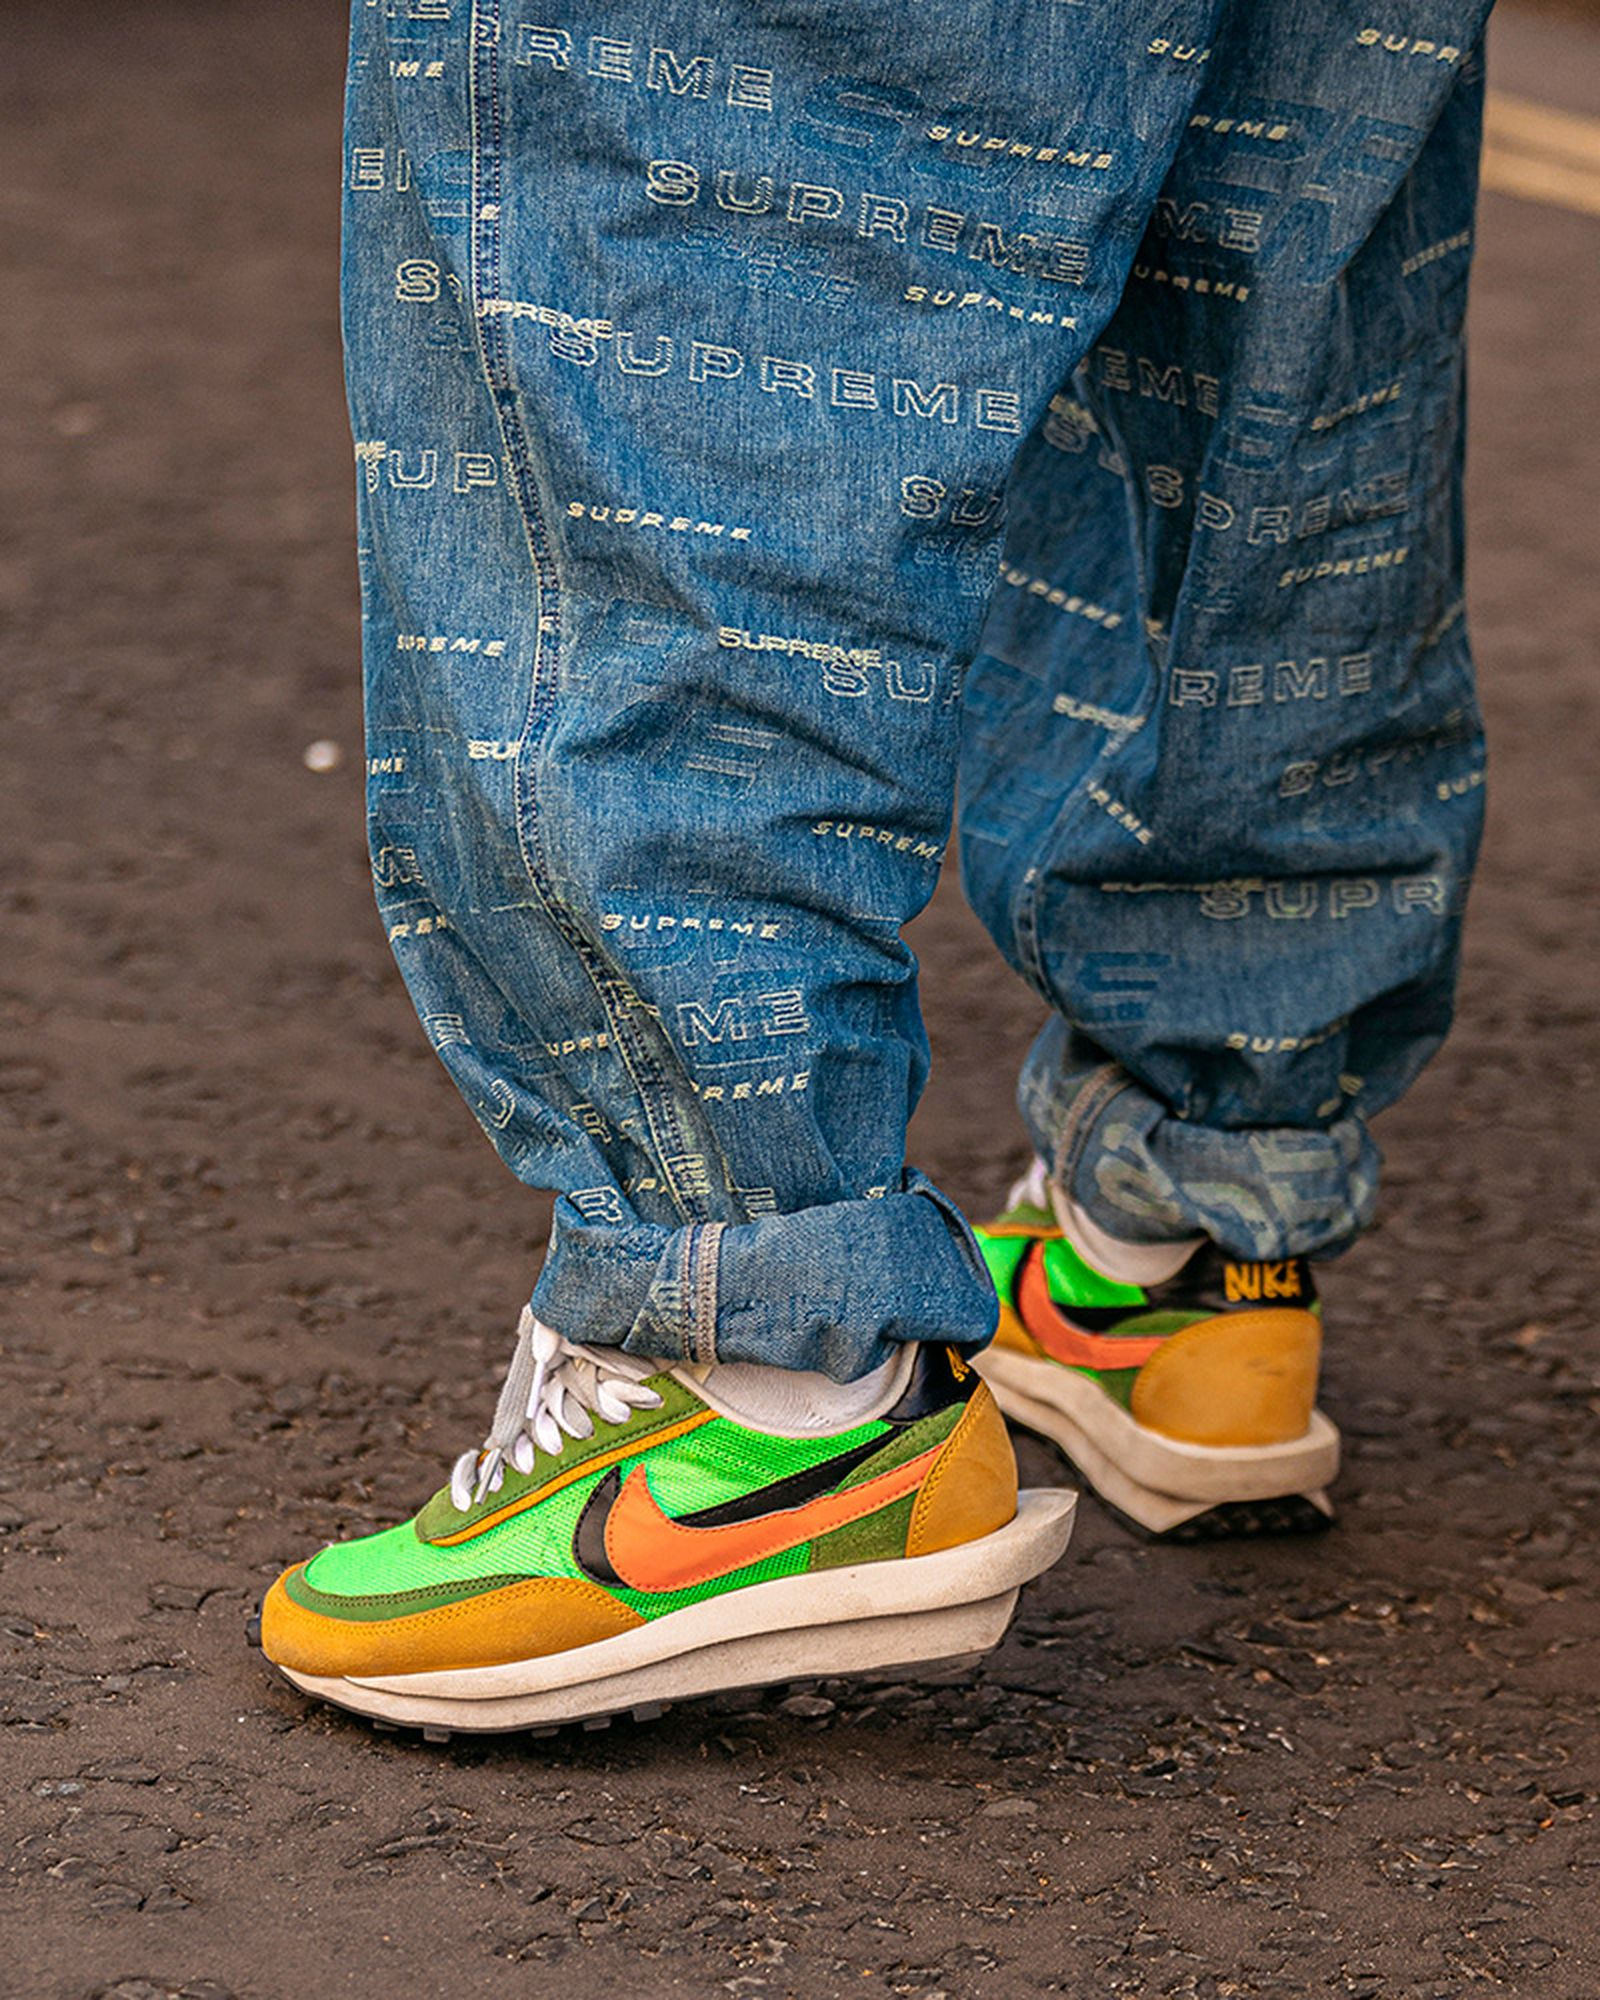 WSS20_London_StreetStyle_Sneakers_Asia_Typek_02